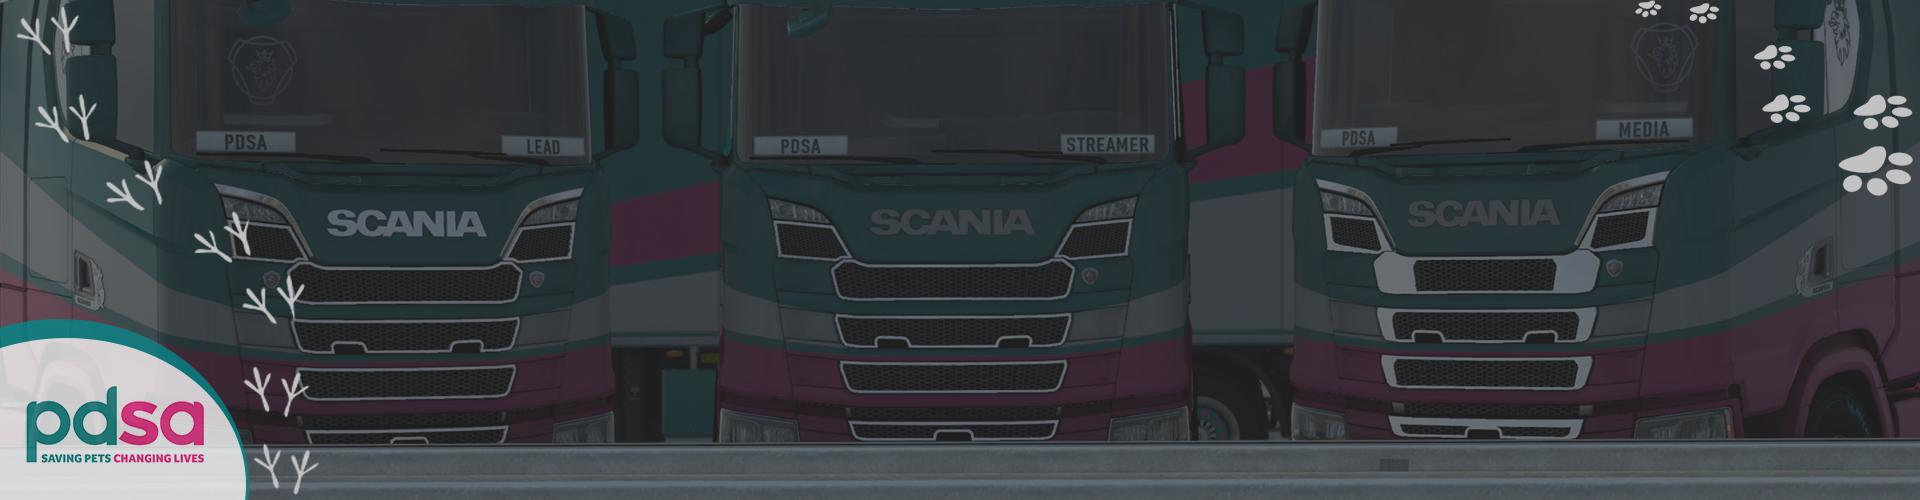 PDSA Convoy 2022